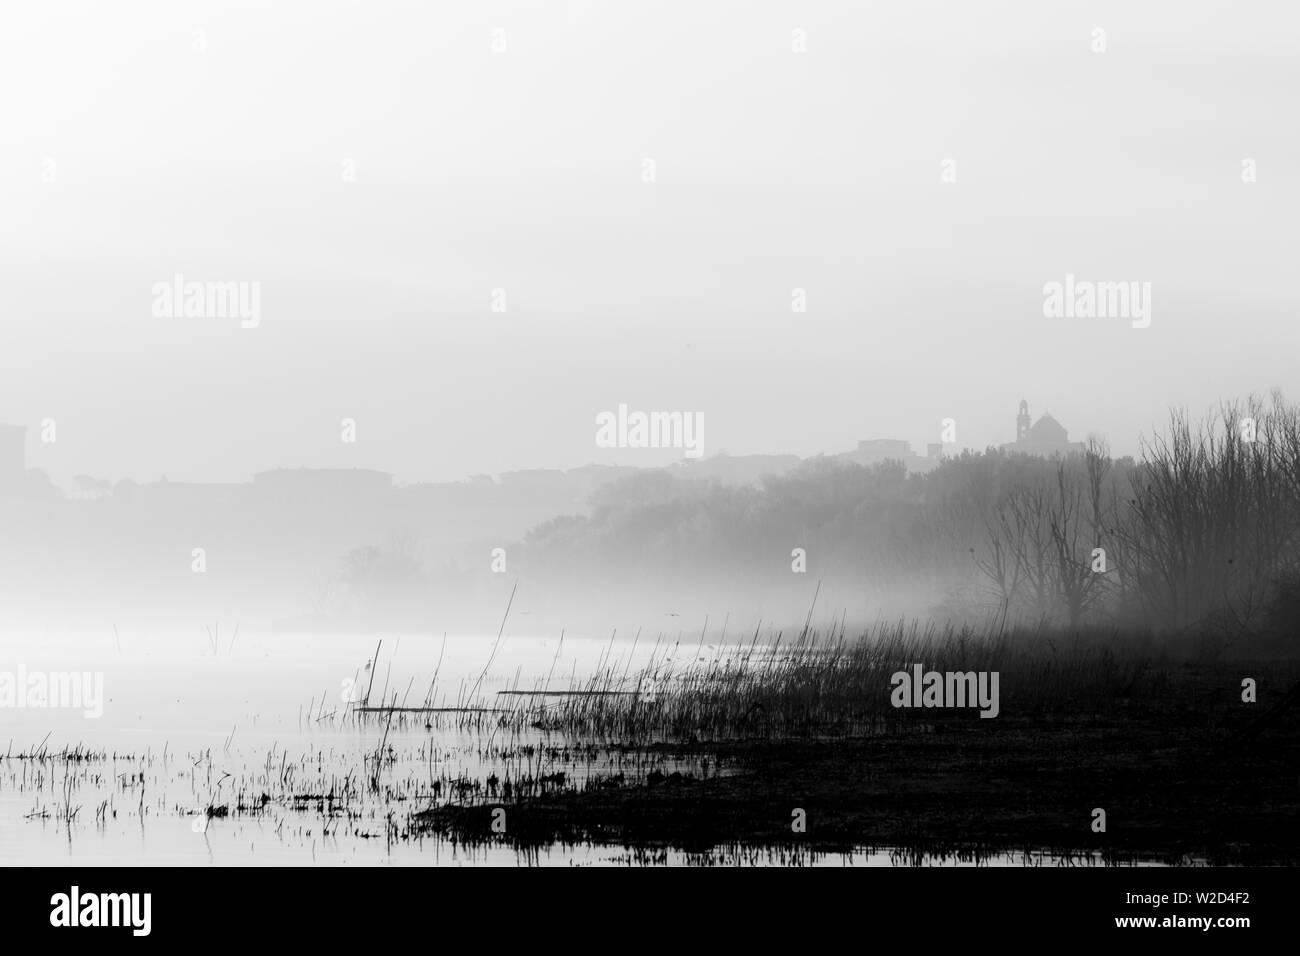 Beautiful view of Trasimeno lake (Umbria) shore at dawn, with Castiglione del LAgo town at the distance - Stock Image